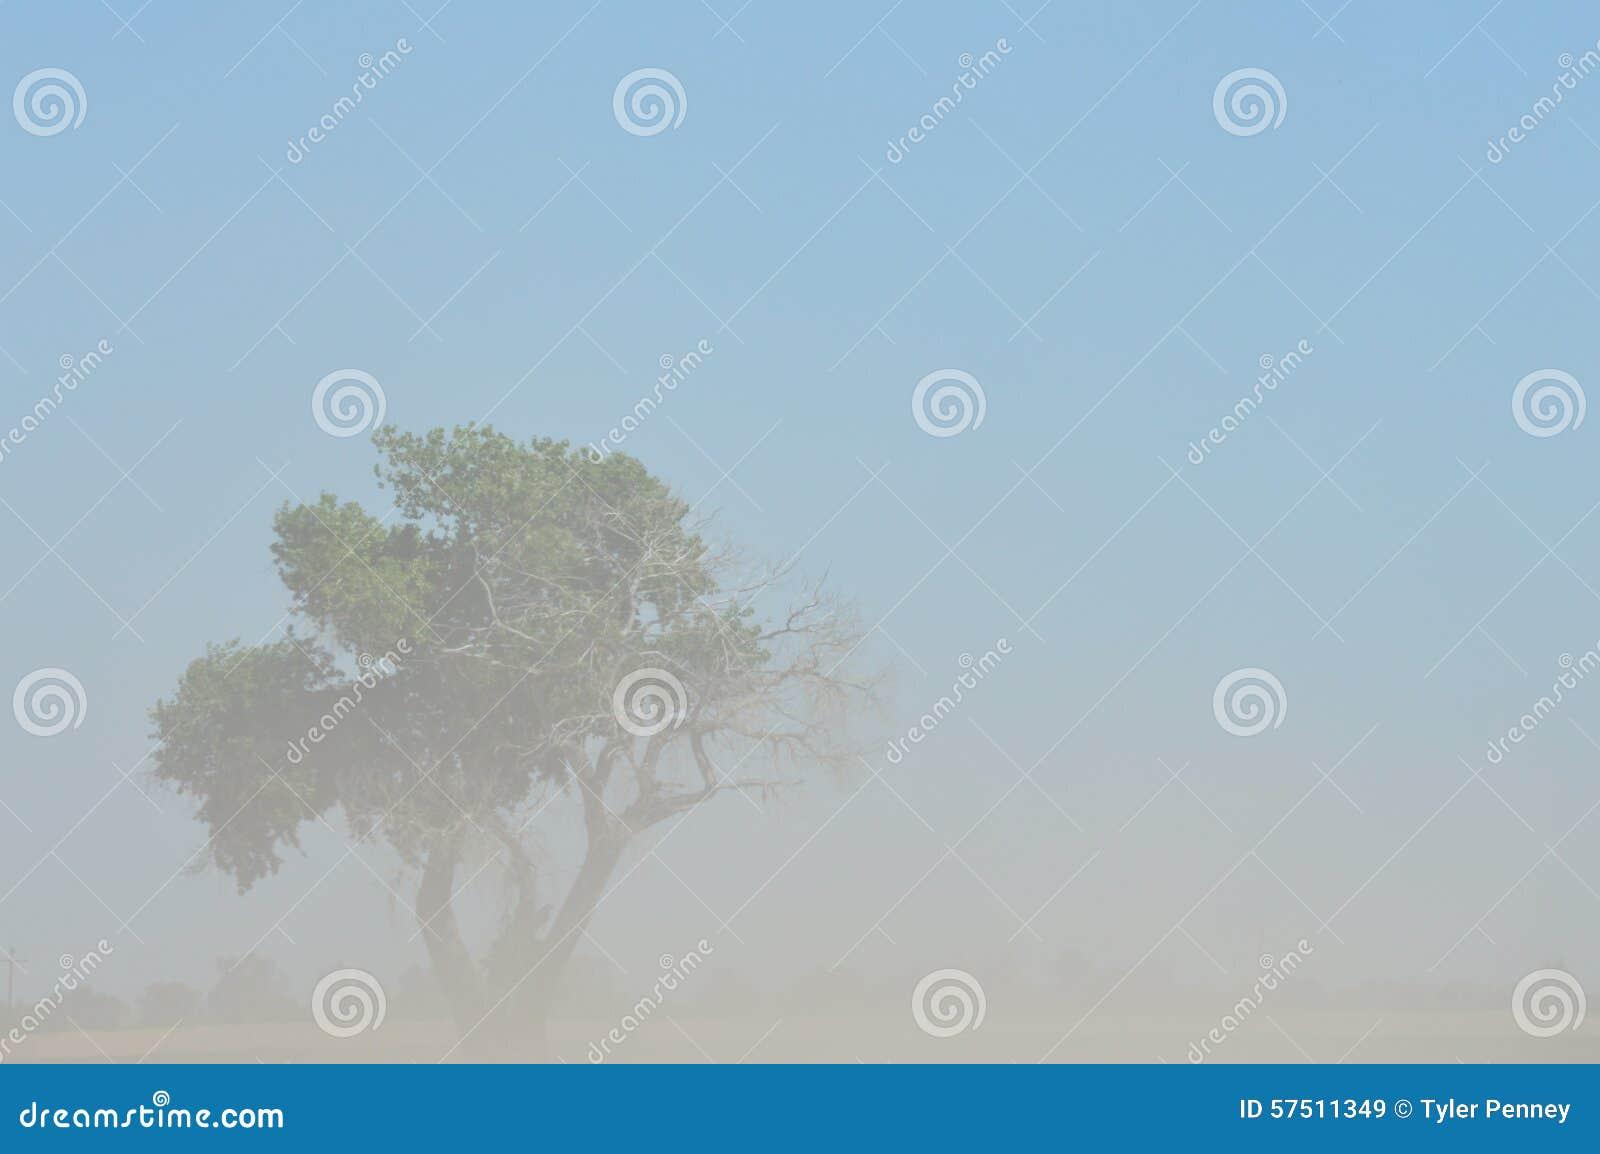 Dead And Alive Stock Image Image Of Dust Tree Arizona 57511349